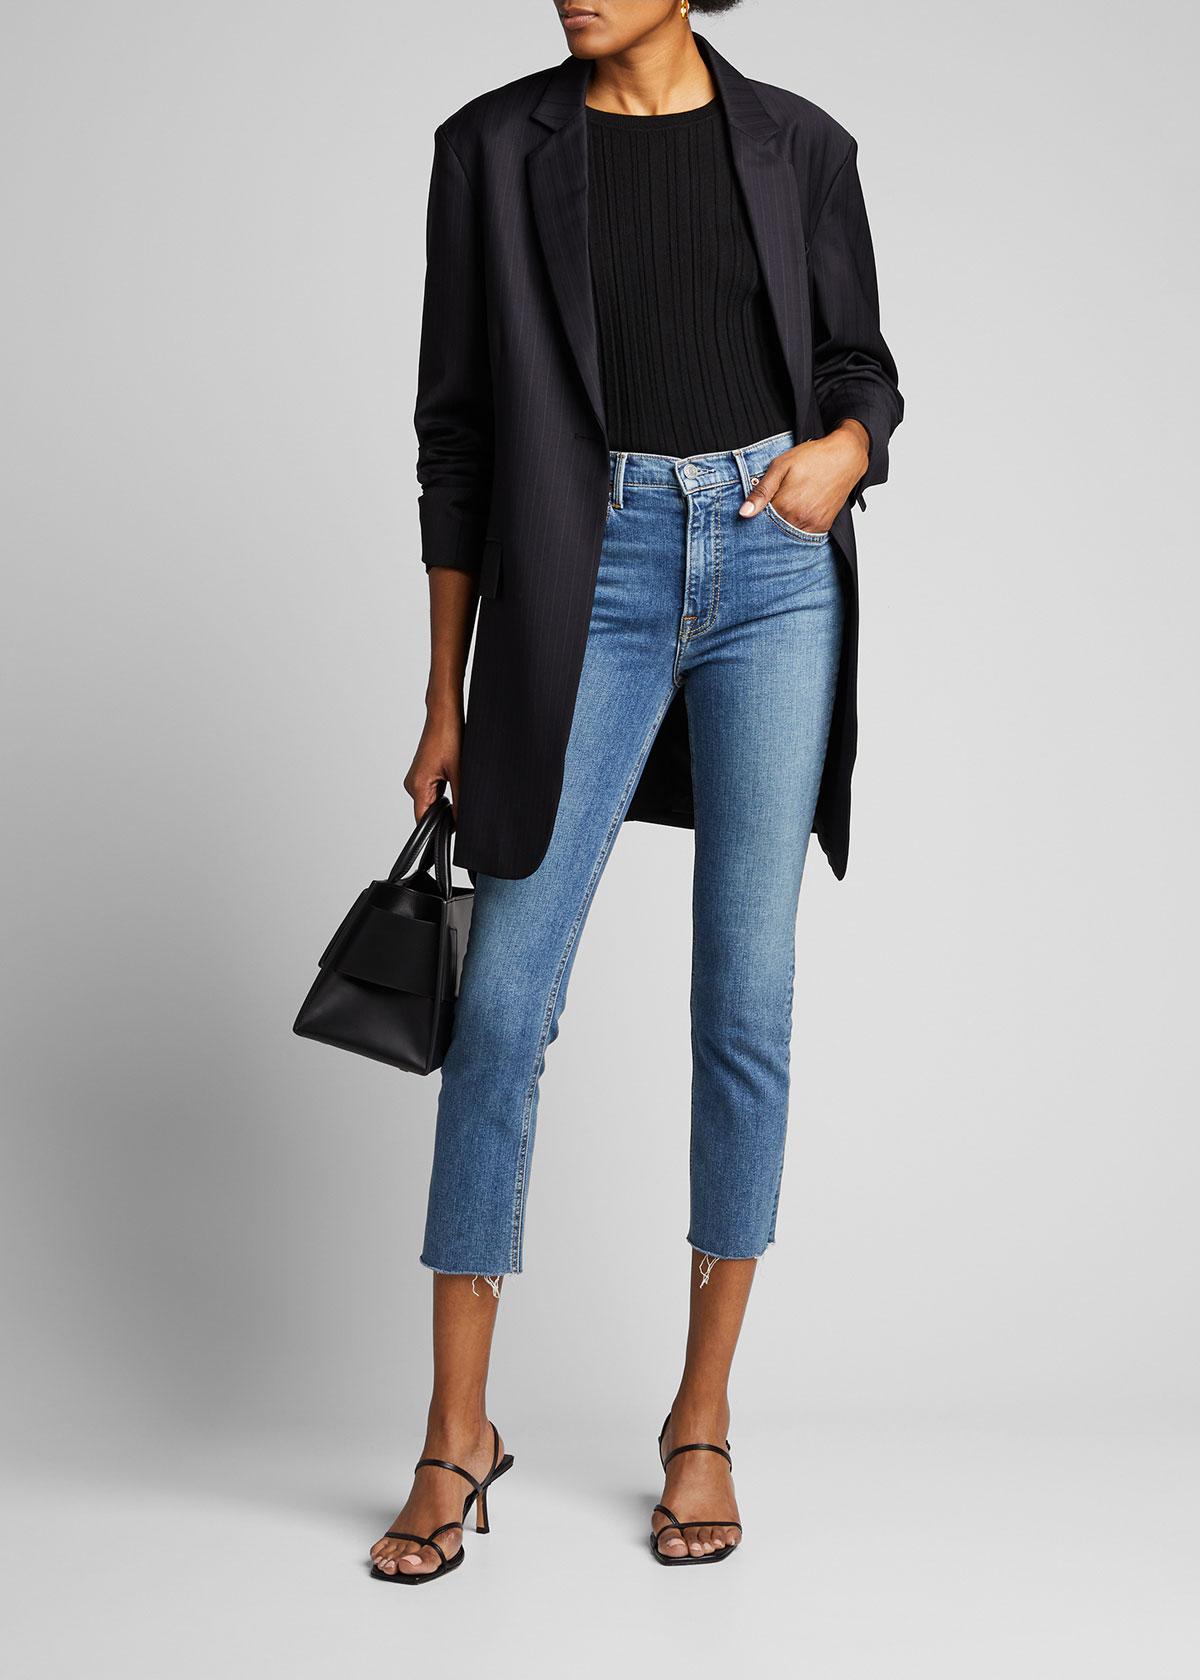 Grlfrnd Reed Cropped High-Rise Skinny Jeans